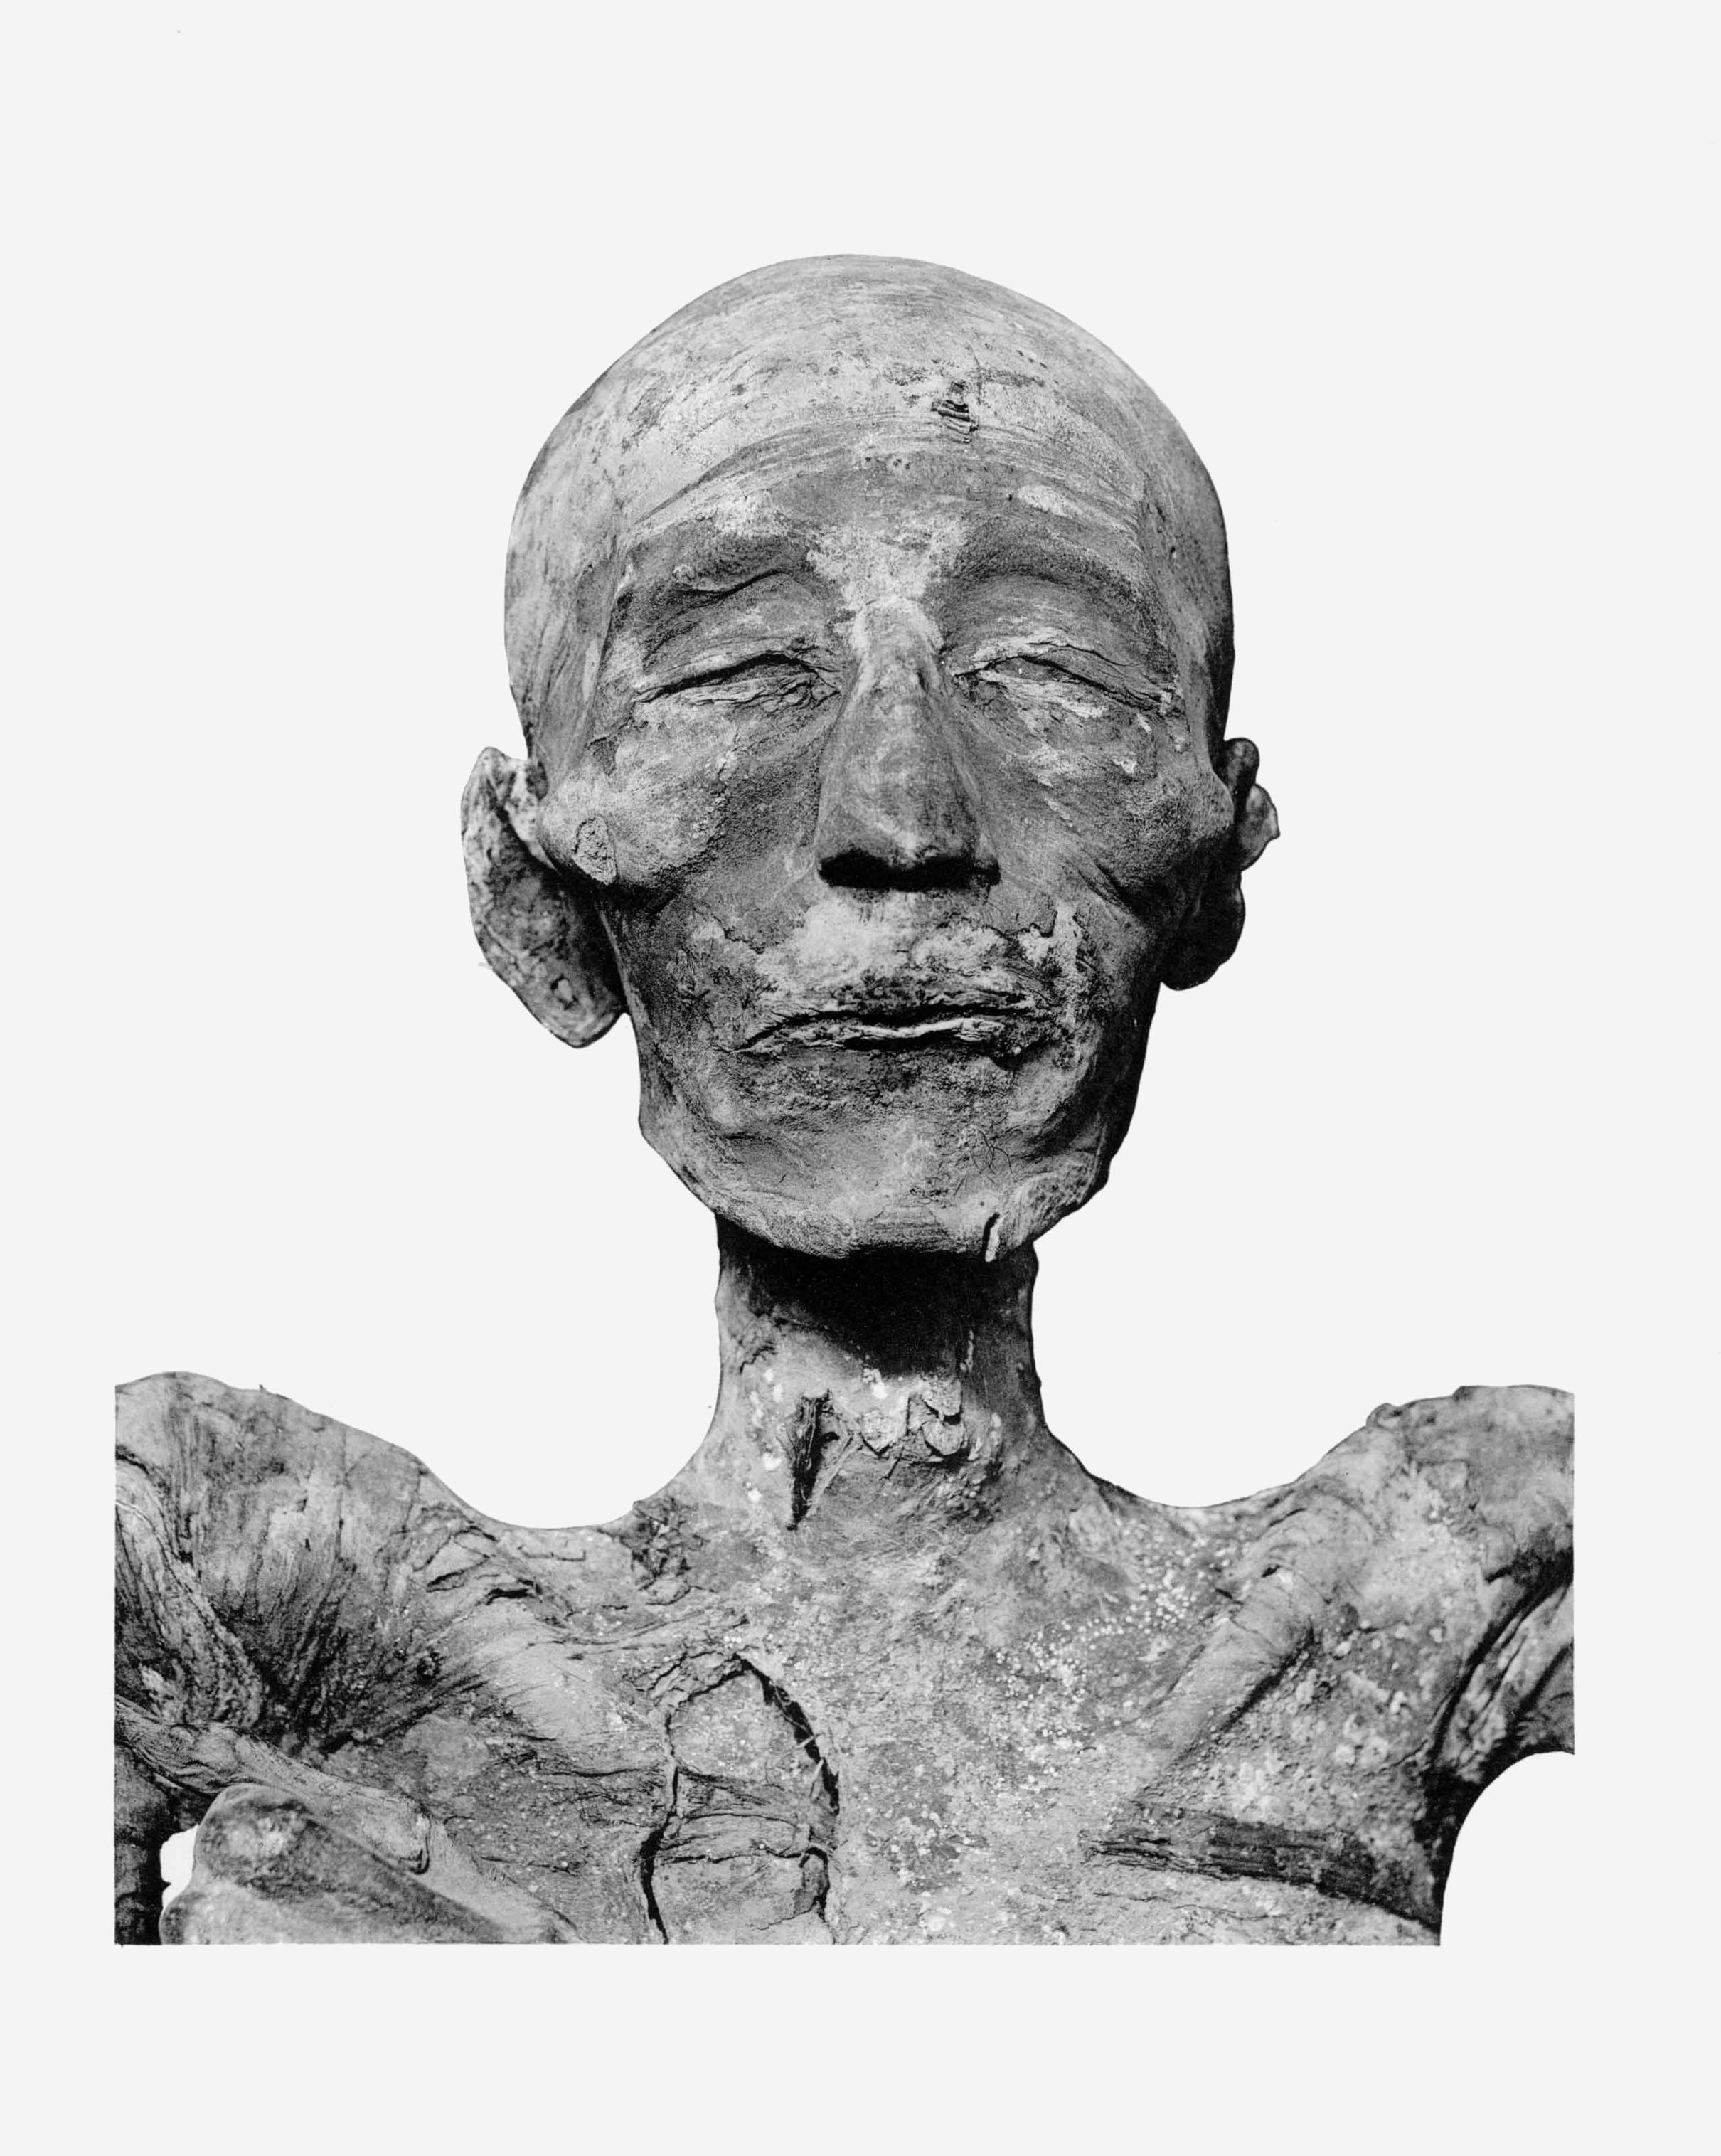 File:Merneptah mummy head.png - Wikimedia Commons